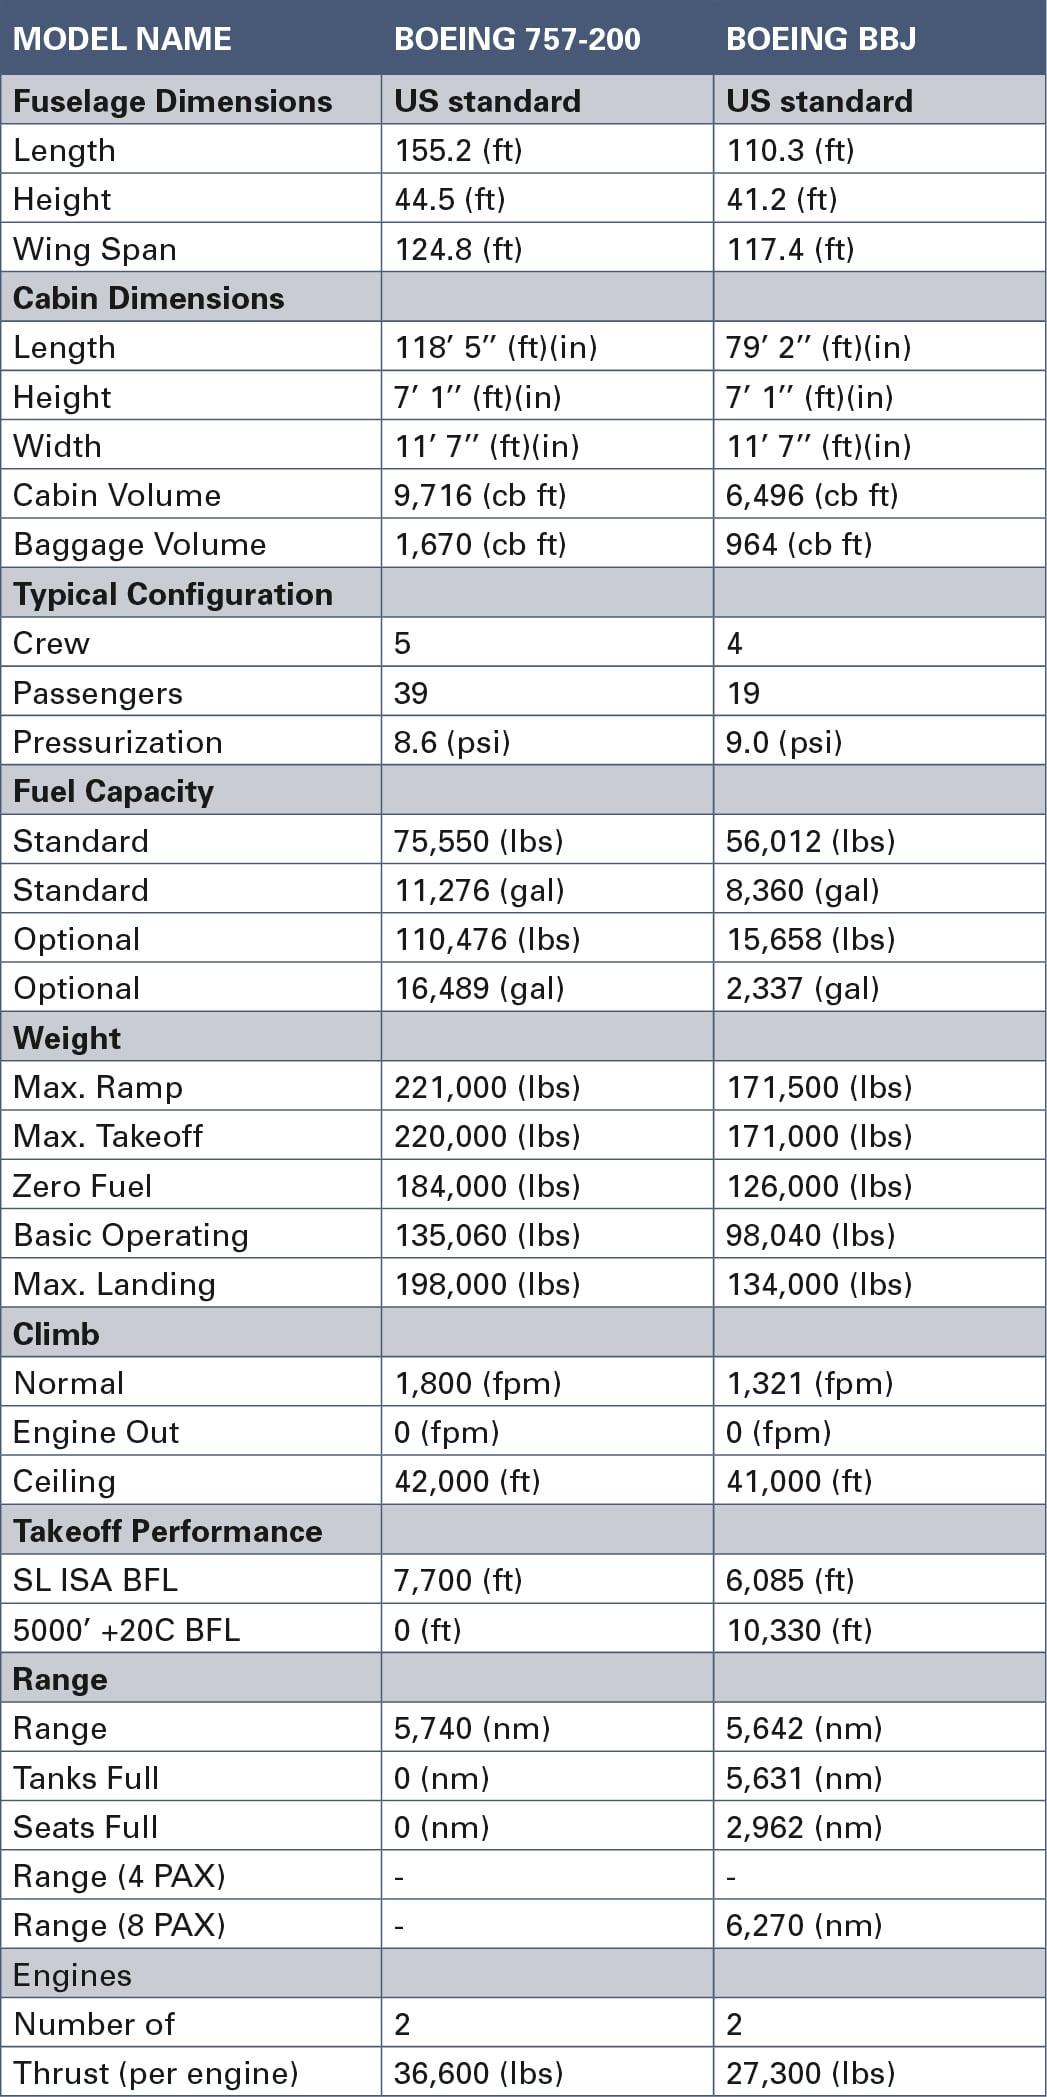 BBJ757 Operational Comparison